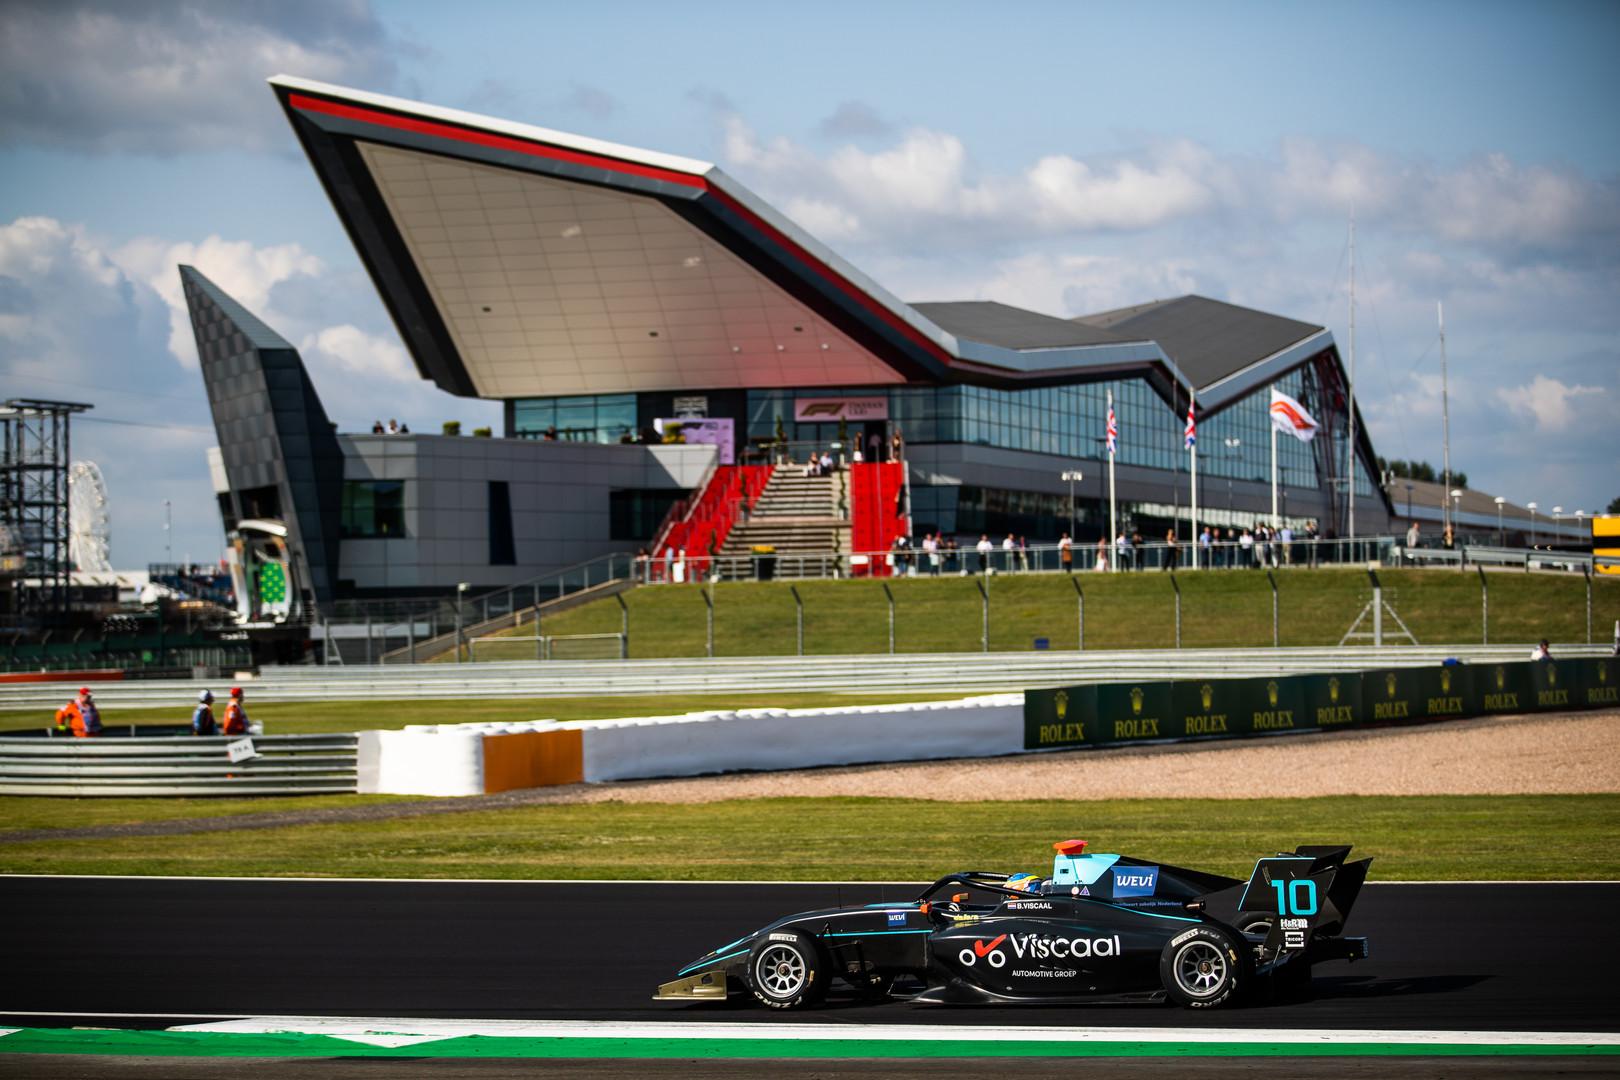 Bent F3 Silverstone 14-07-2019-18.jpg